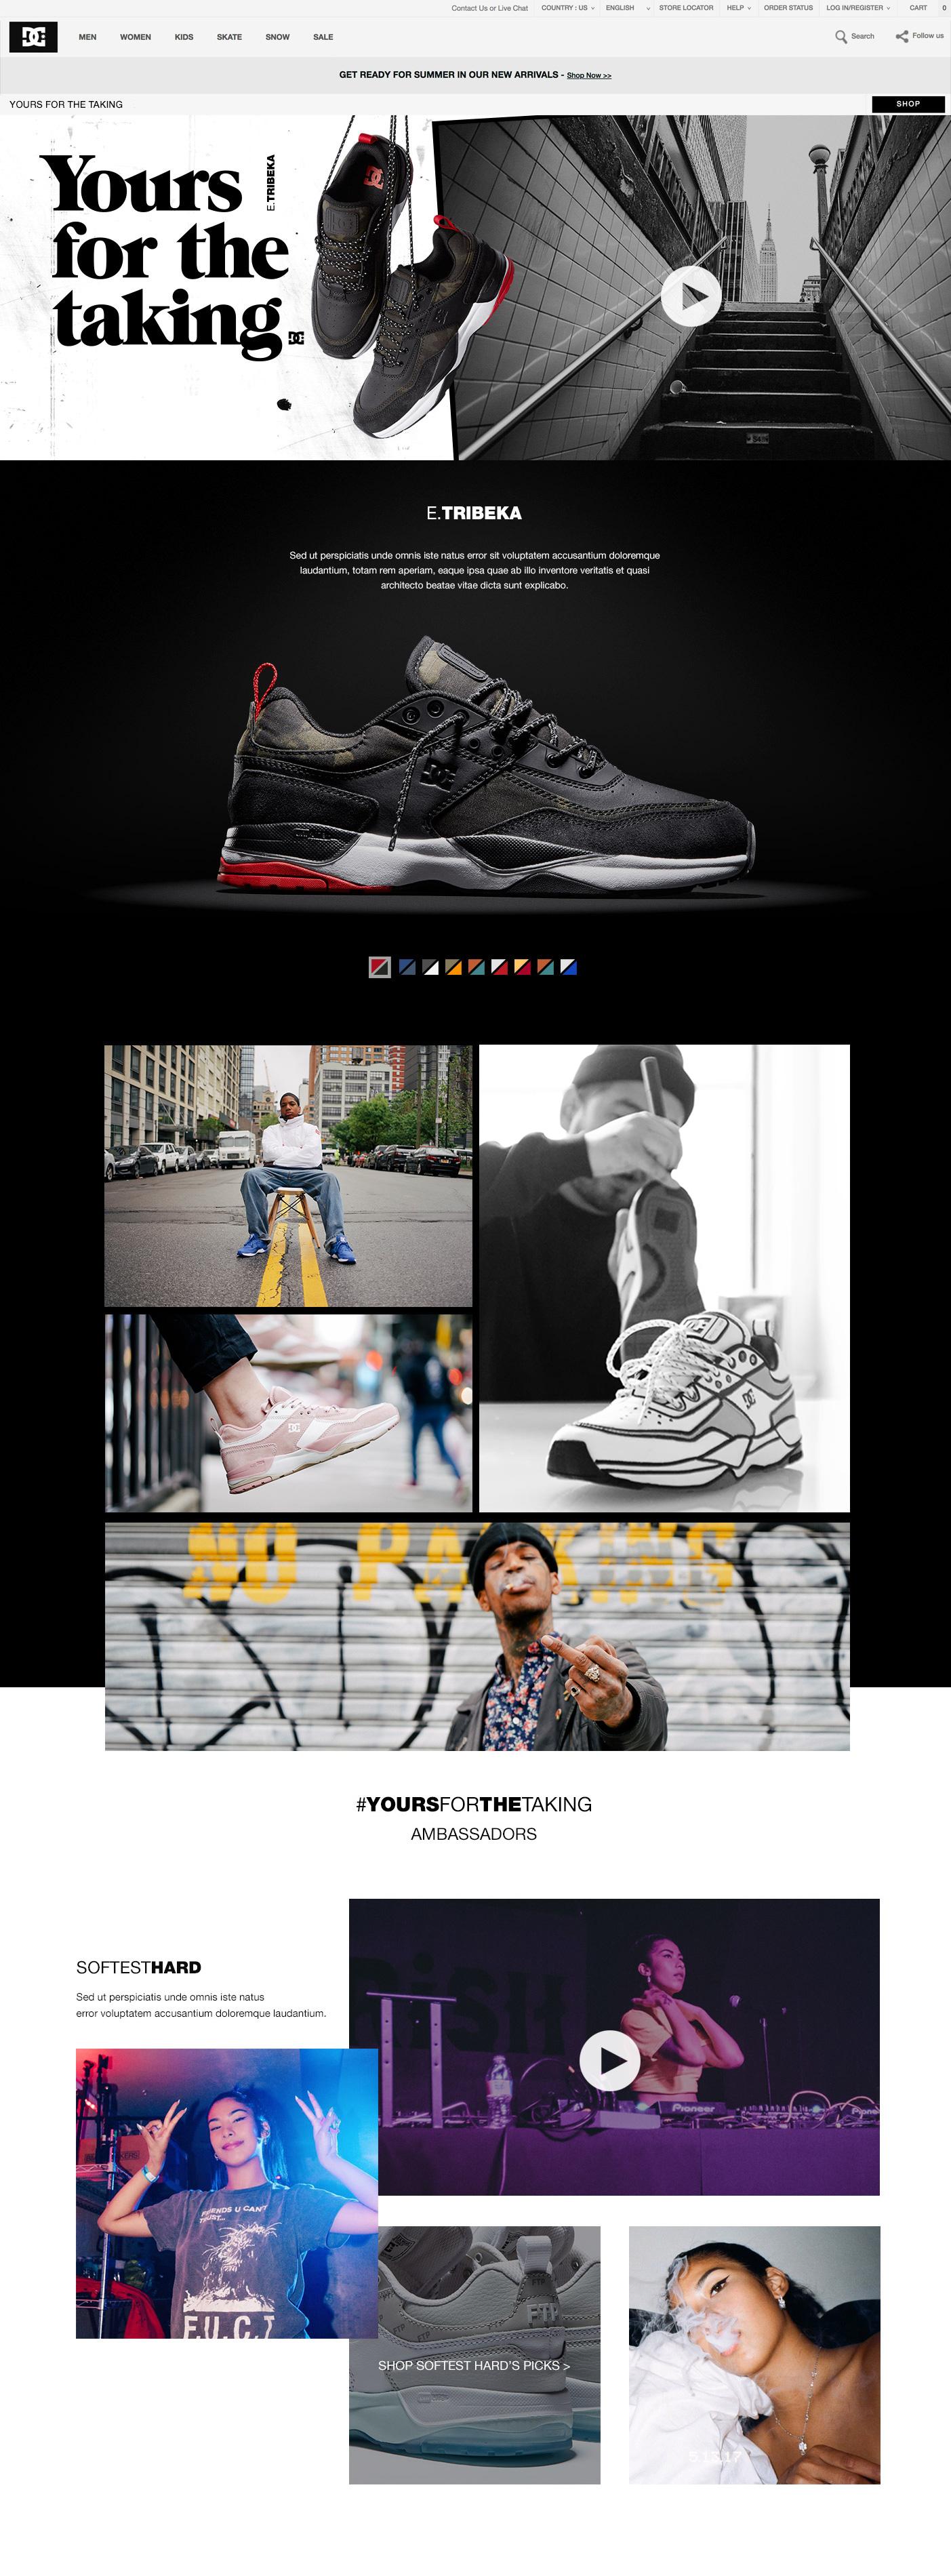 #YoursForTheTakingE.Tribeka shoes - User Experience / Digital Campaign DesignCreative Direction: Alessandro GrisonPhotos: Steve Treboux / Mike HeikkilaVideos: Chris Ray, Martin Forbes, Sam Sosnowski, Massimo LegittimoProducer: EJ Binn